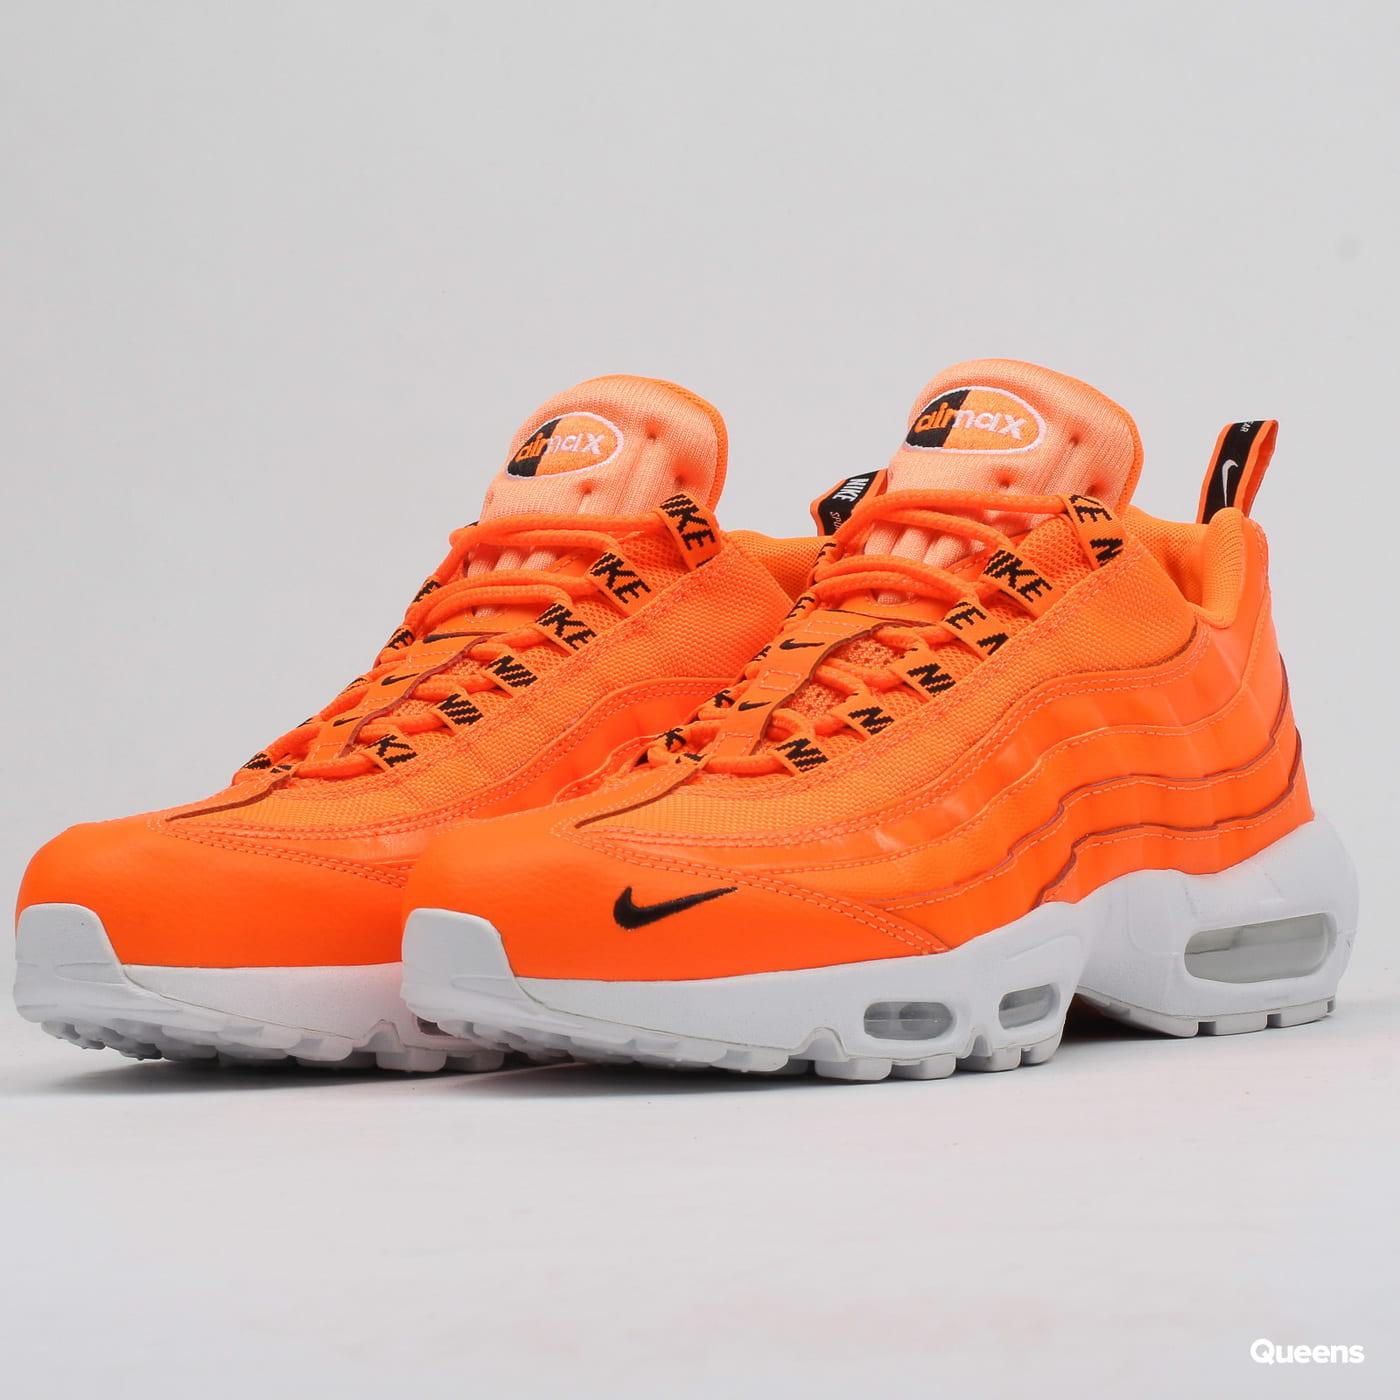 35065edea8 Sneakers Nike Air Max 95 Premium (538416-801)– Queens 💚